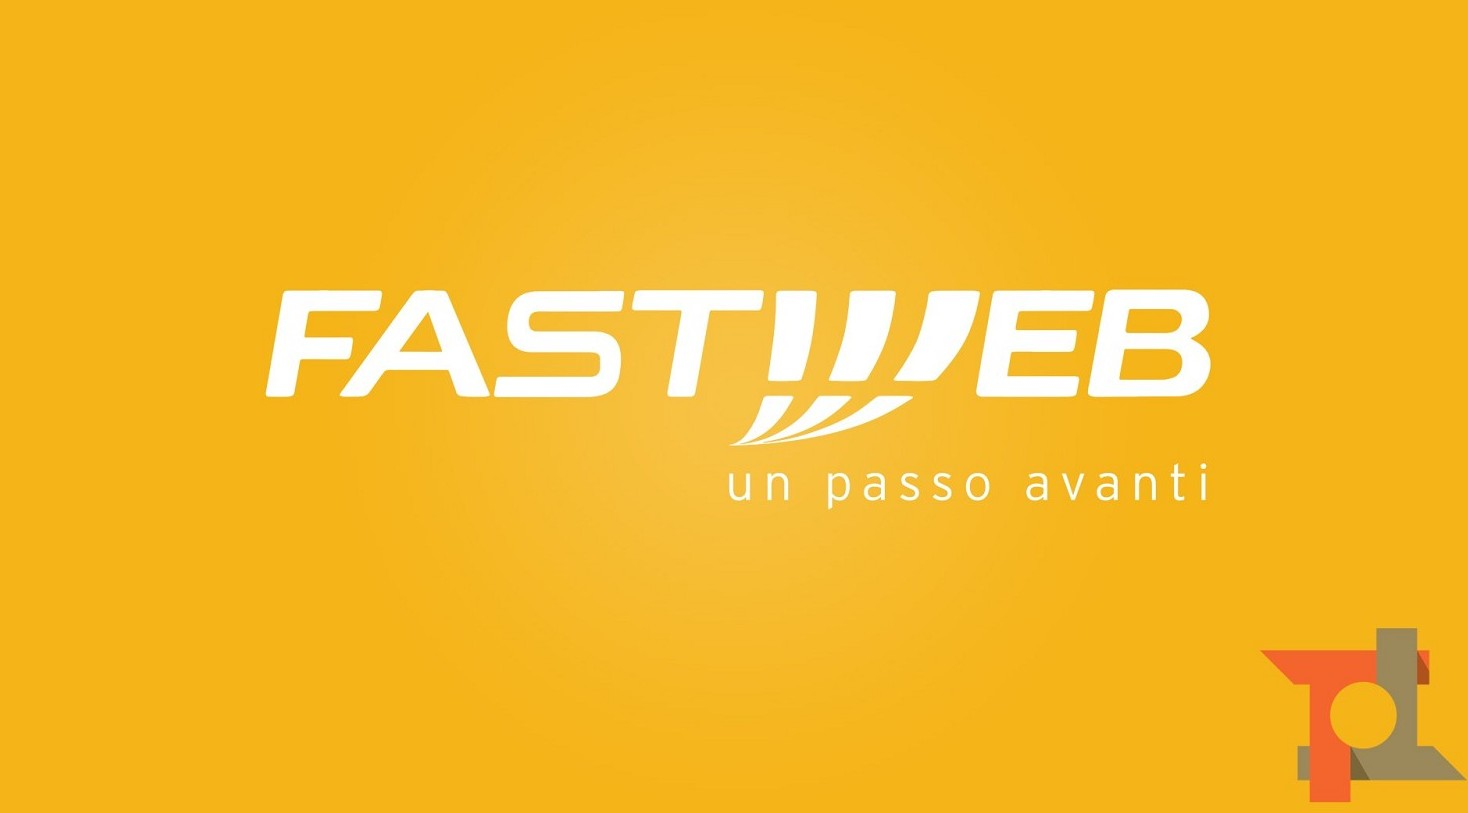 Copertura Fibra Fastweb 2019: l'ultrabro